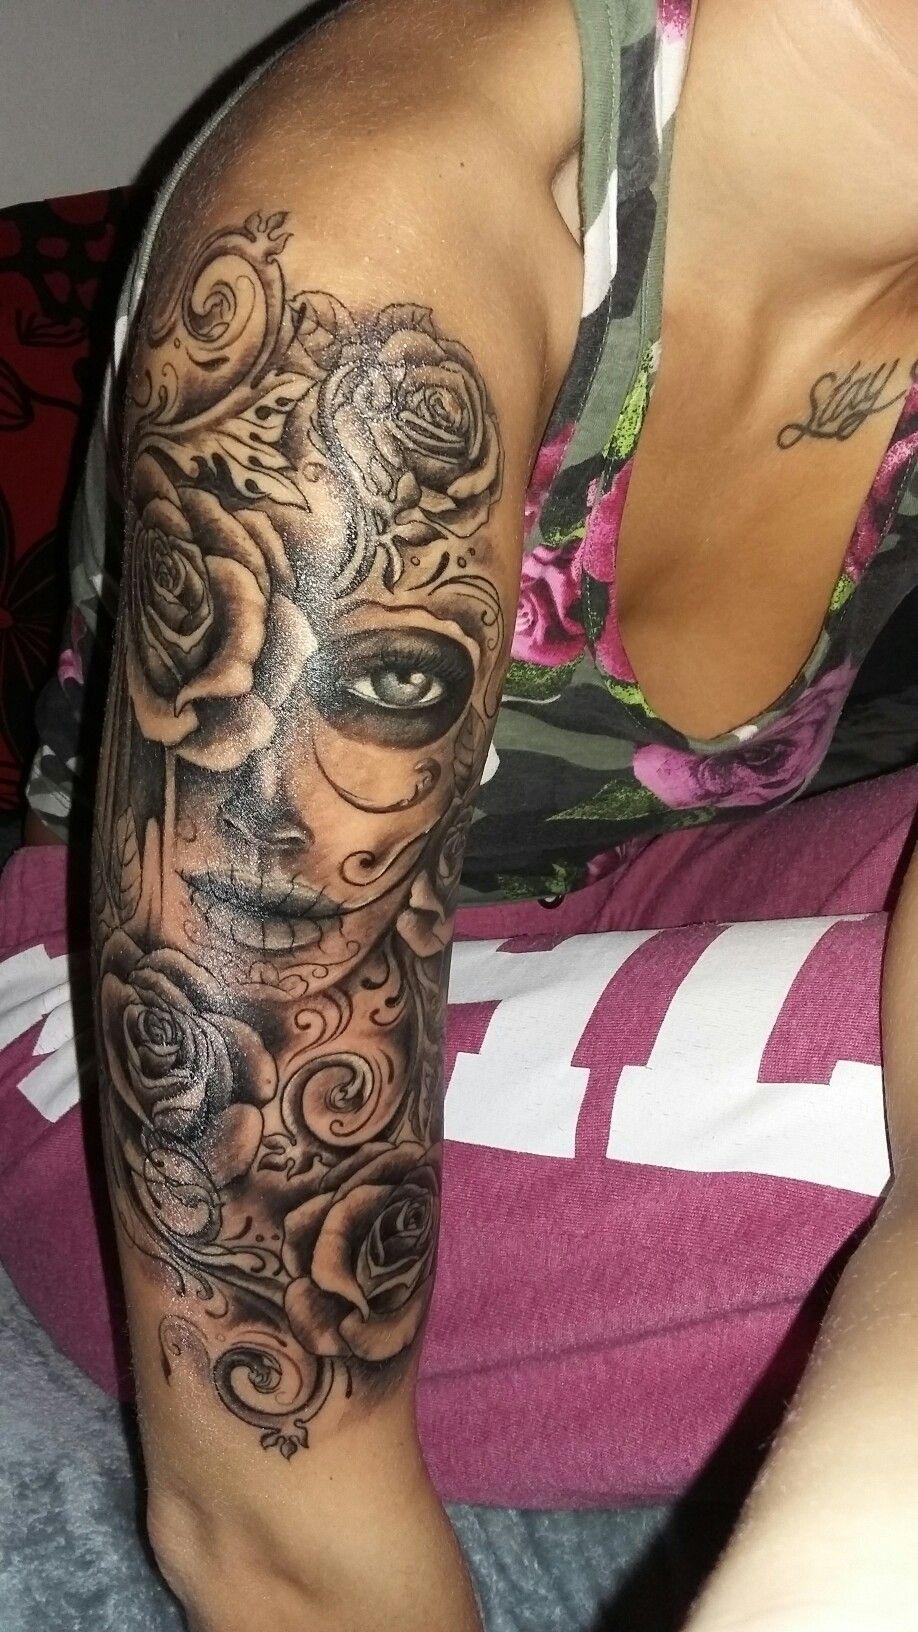 Muerte tattoo Girls Tattoos Pinterest Tatuajes Ideas de